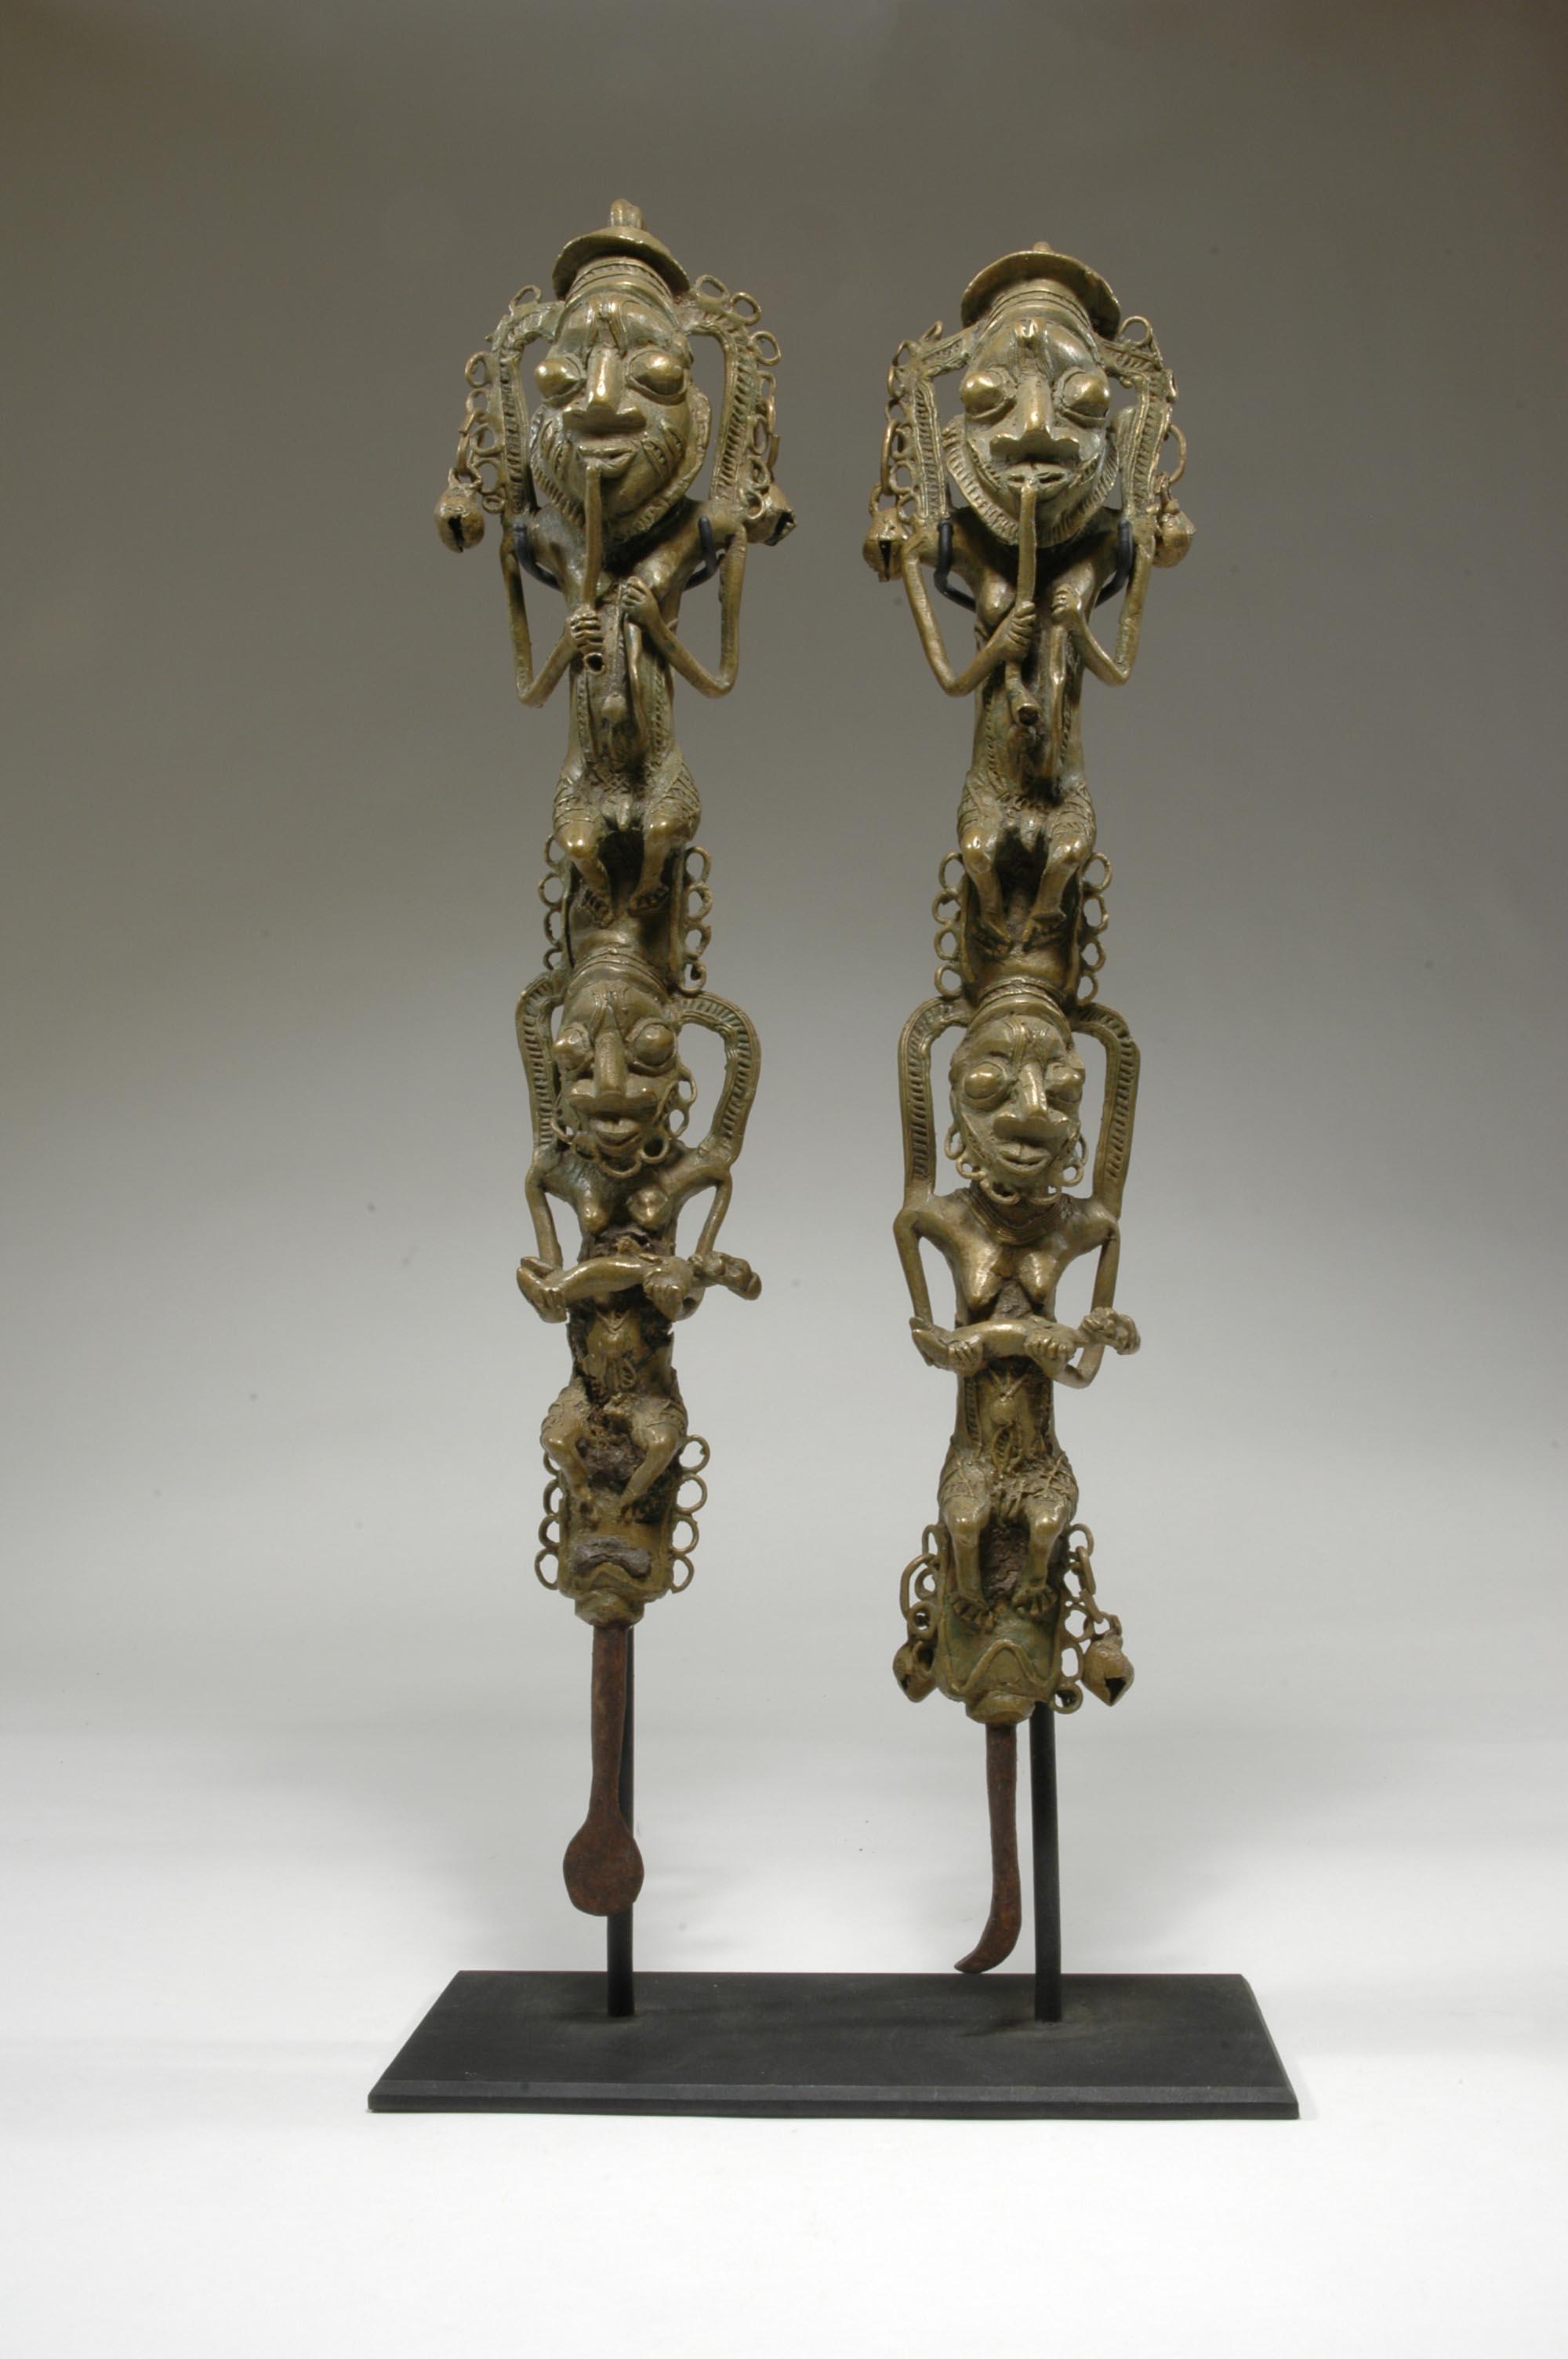 Artist unknown (Yorùbápeoples, Nigeria), figurated staffs for Ògbóni society ( ẹdan Ògbóni),19th century, iron, copper alloy (cast).Charles and Kent Davis